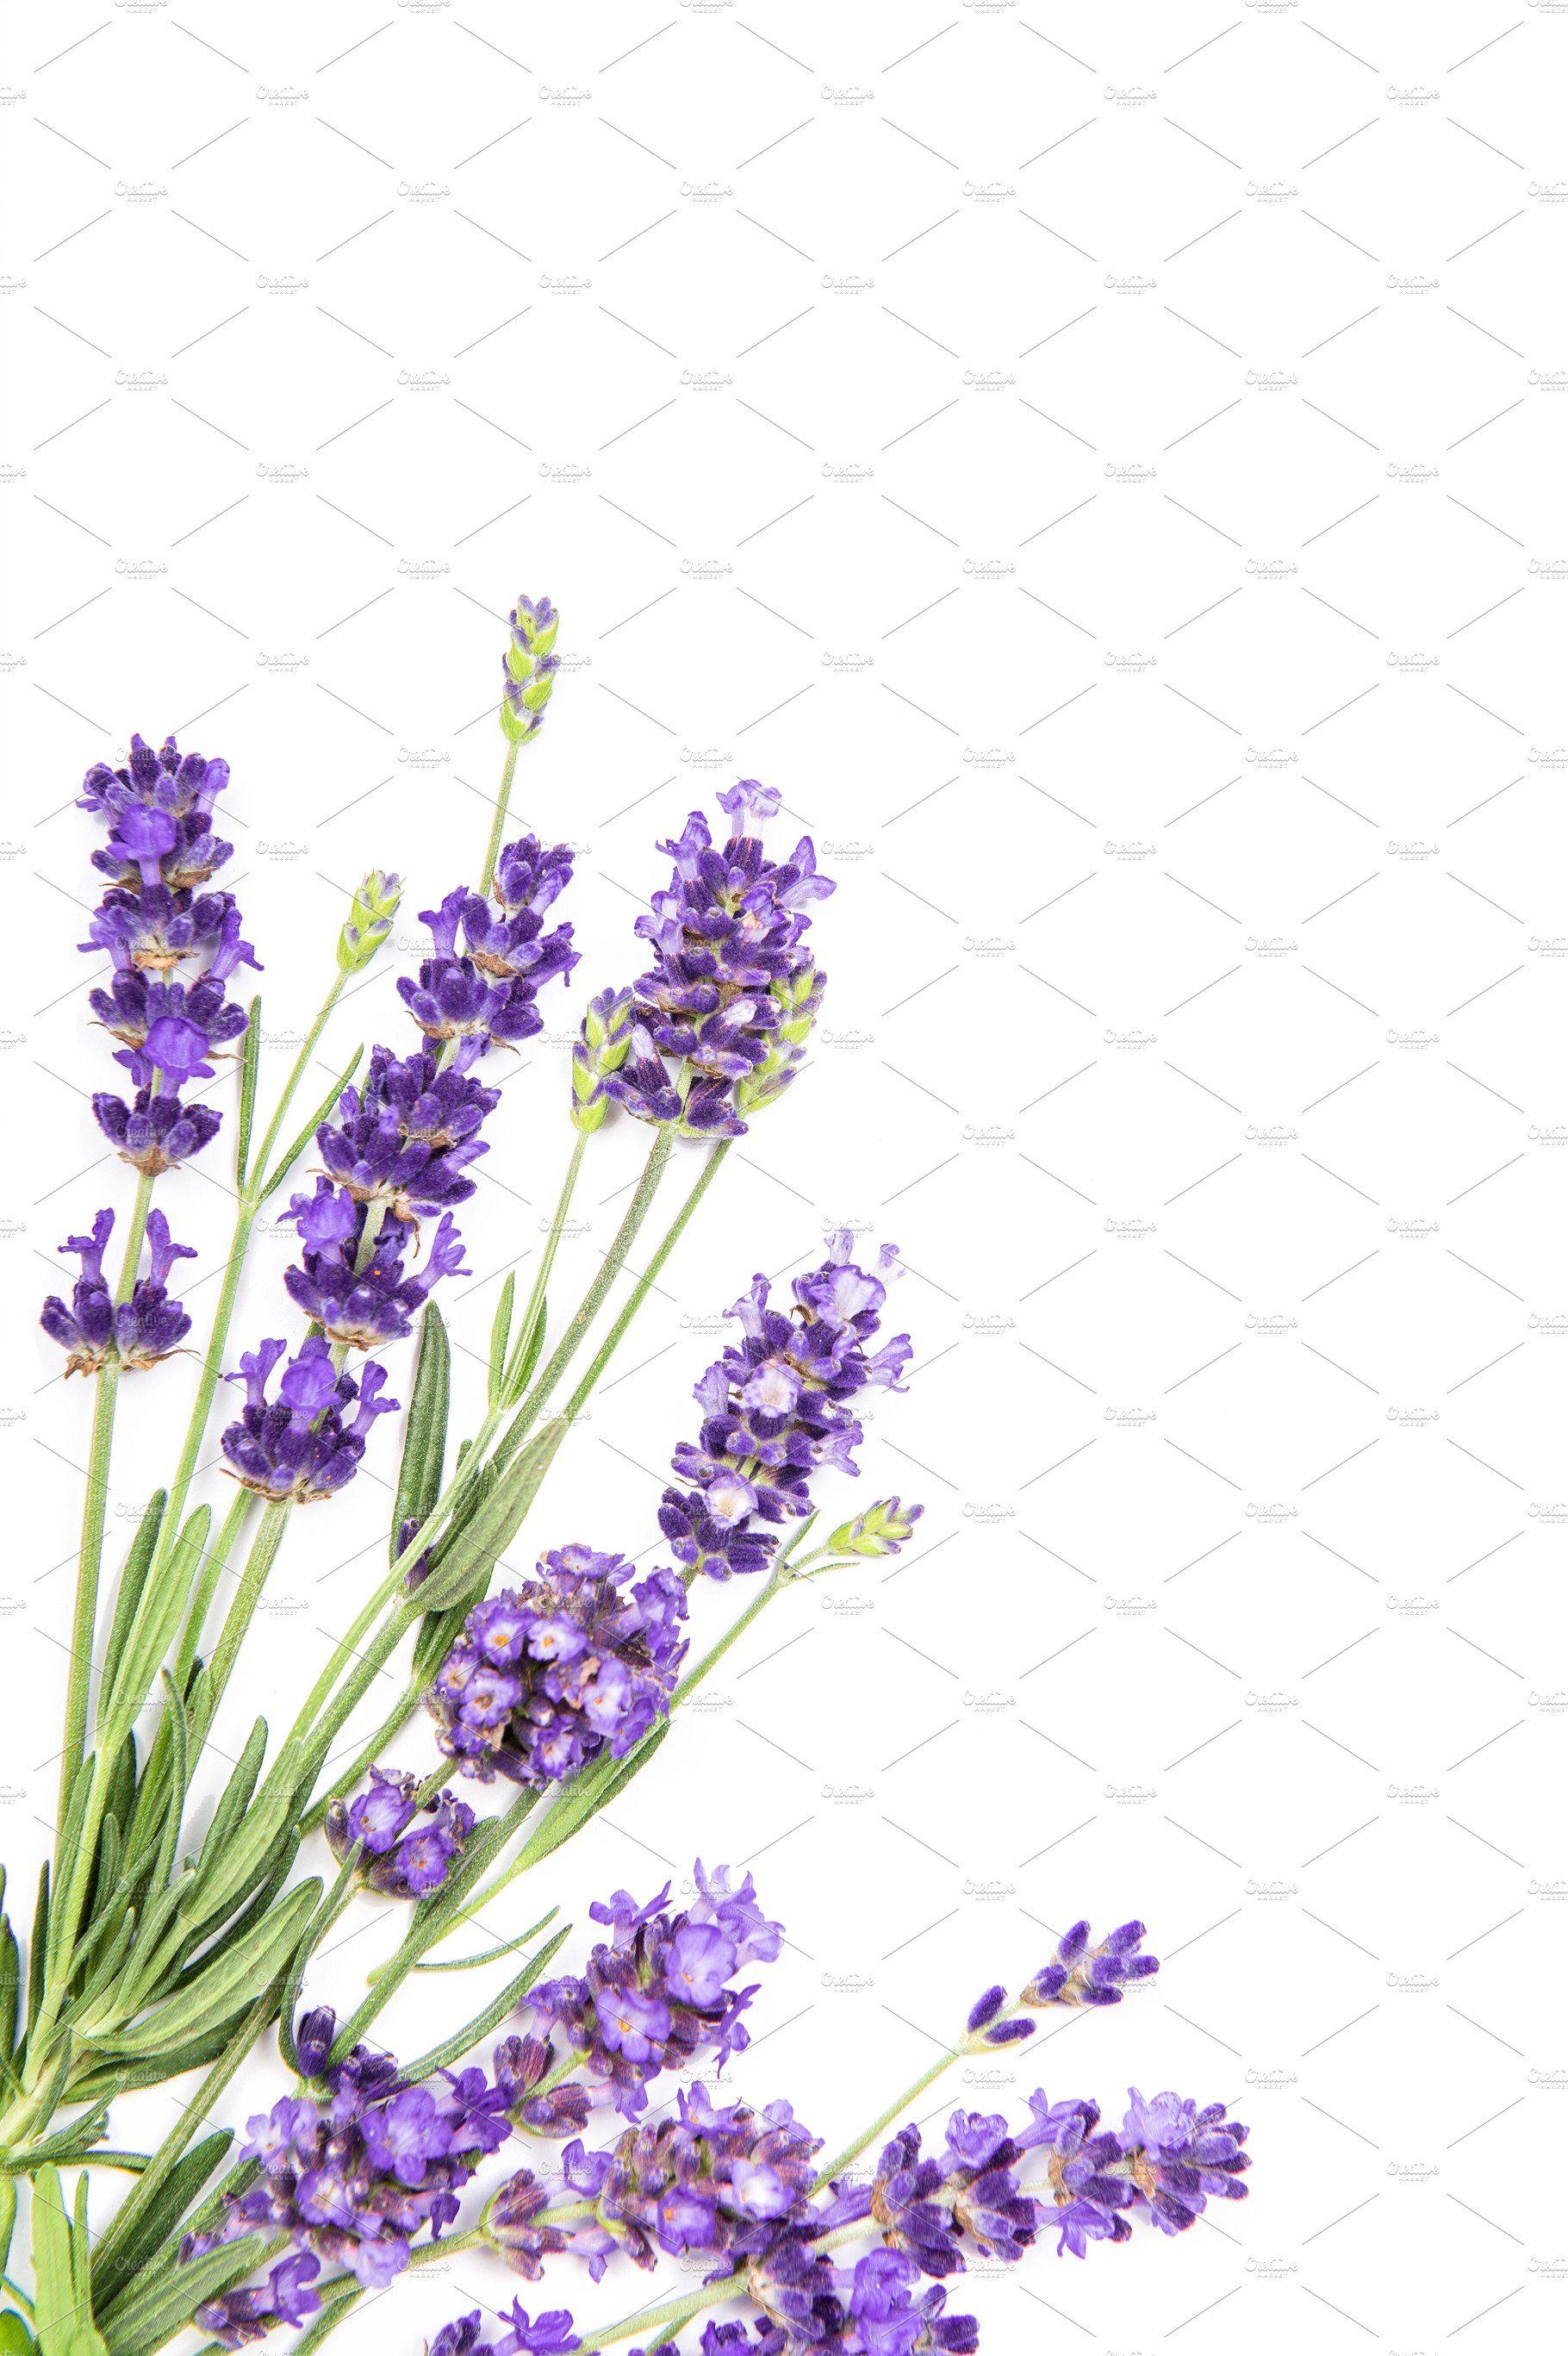 Lavender Flowers White Background In 2020 Lavender Flowers White Background Flower Wallpaper